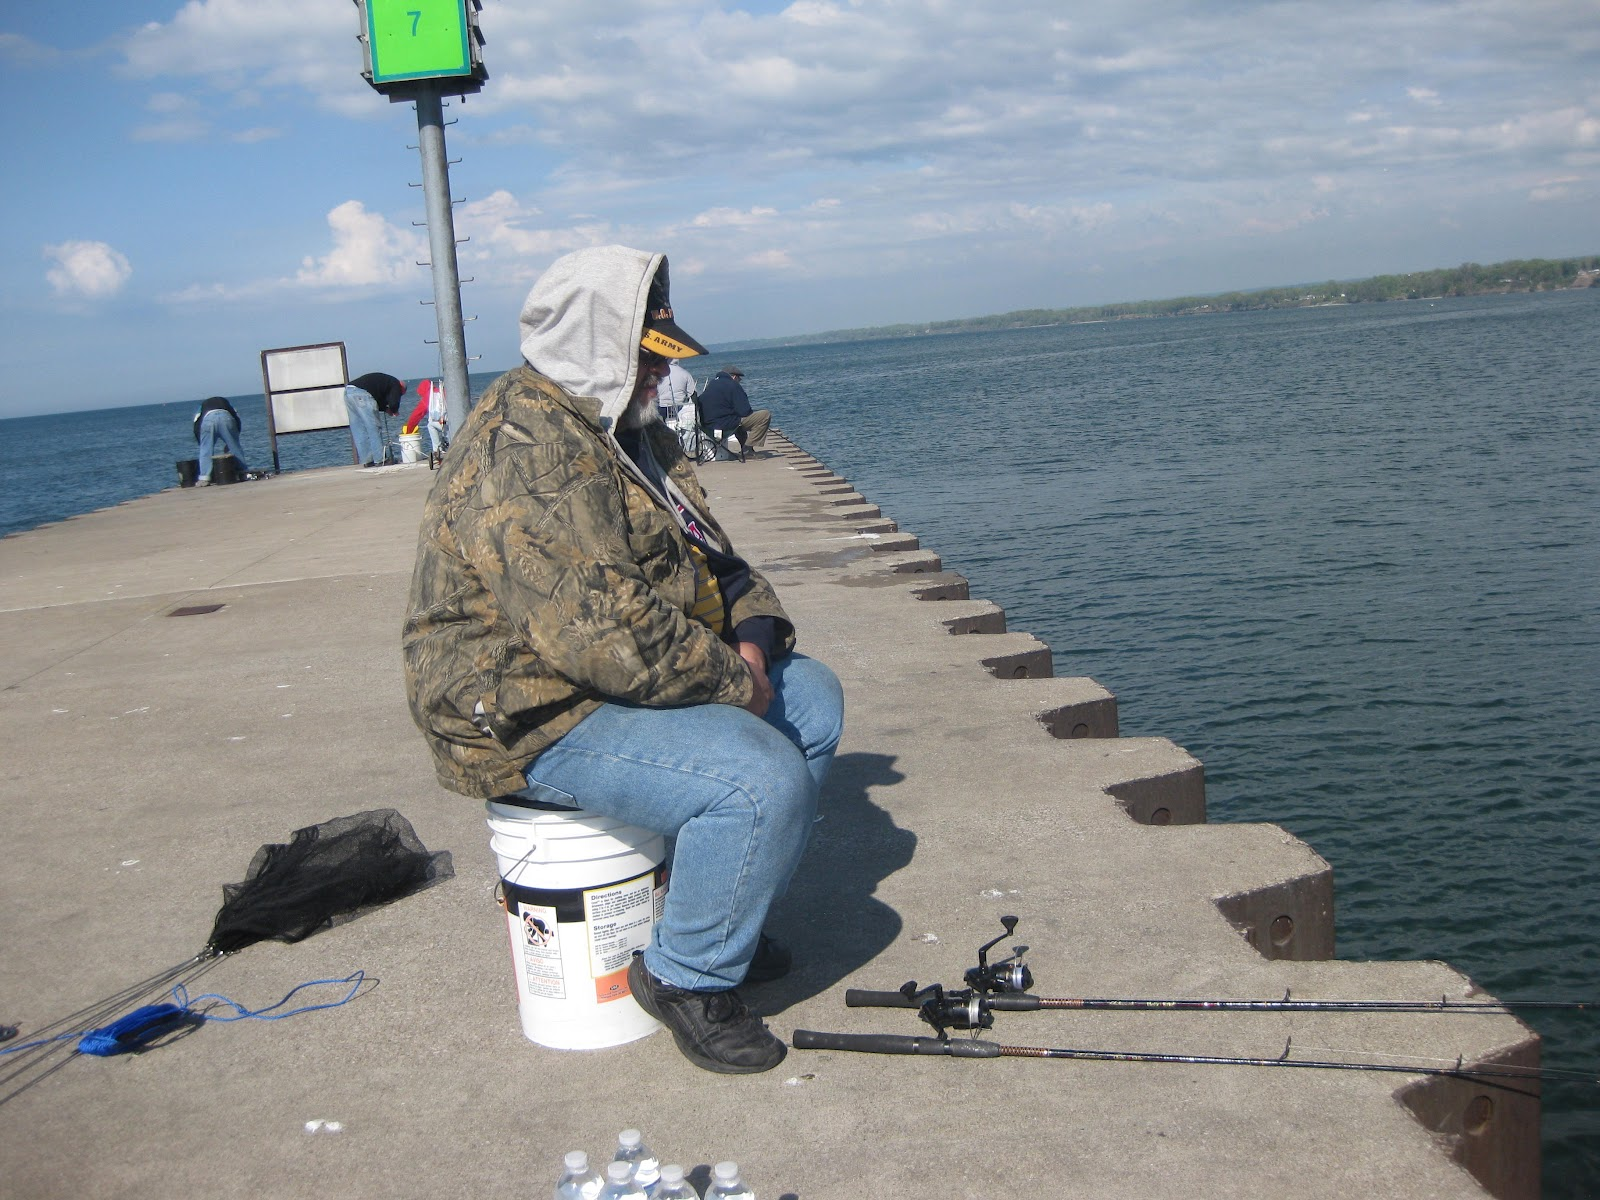 Lake erie fishing blog bay perch season nearing the end for Lake erie fishing hotline